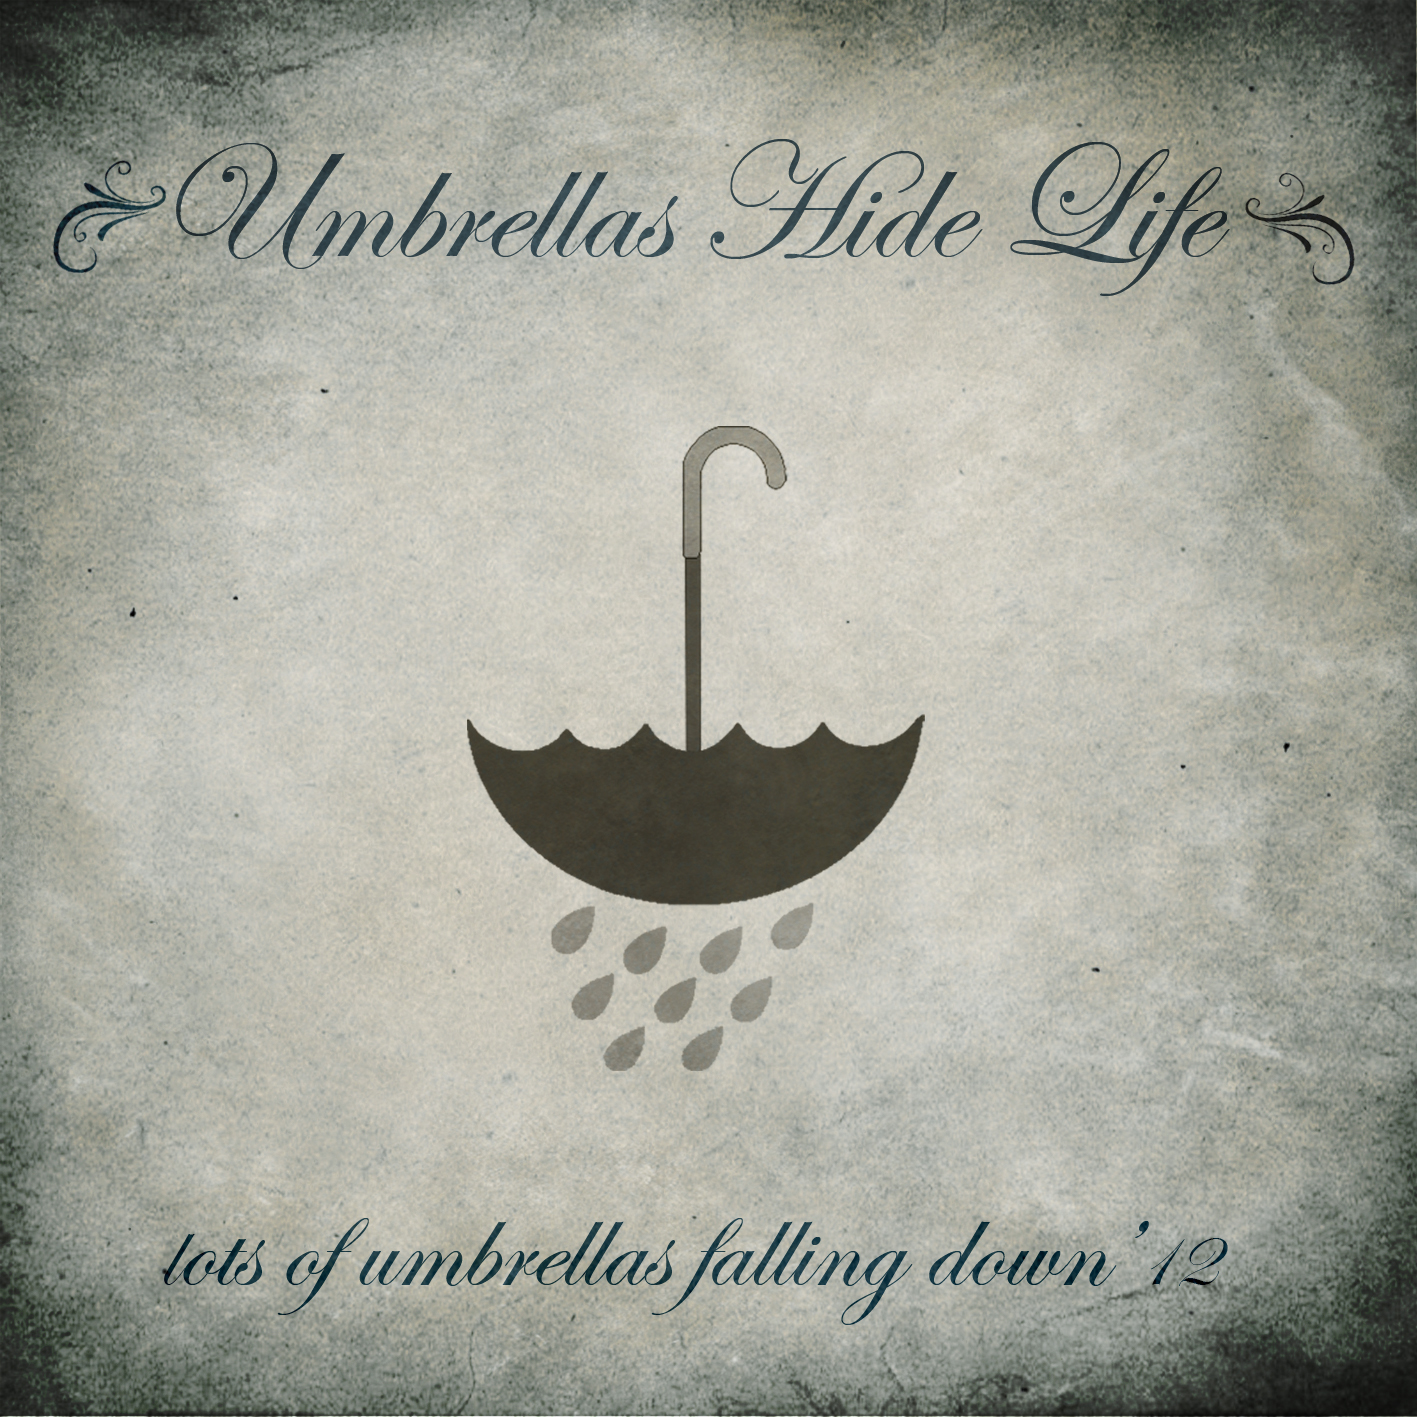 Umbrellas Hide Life--lots of umbrellas falling down